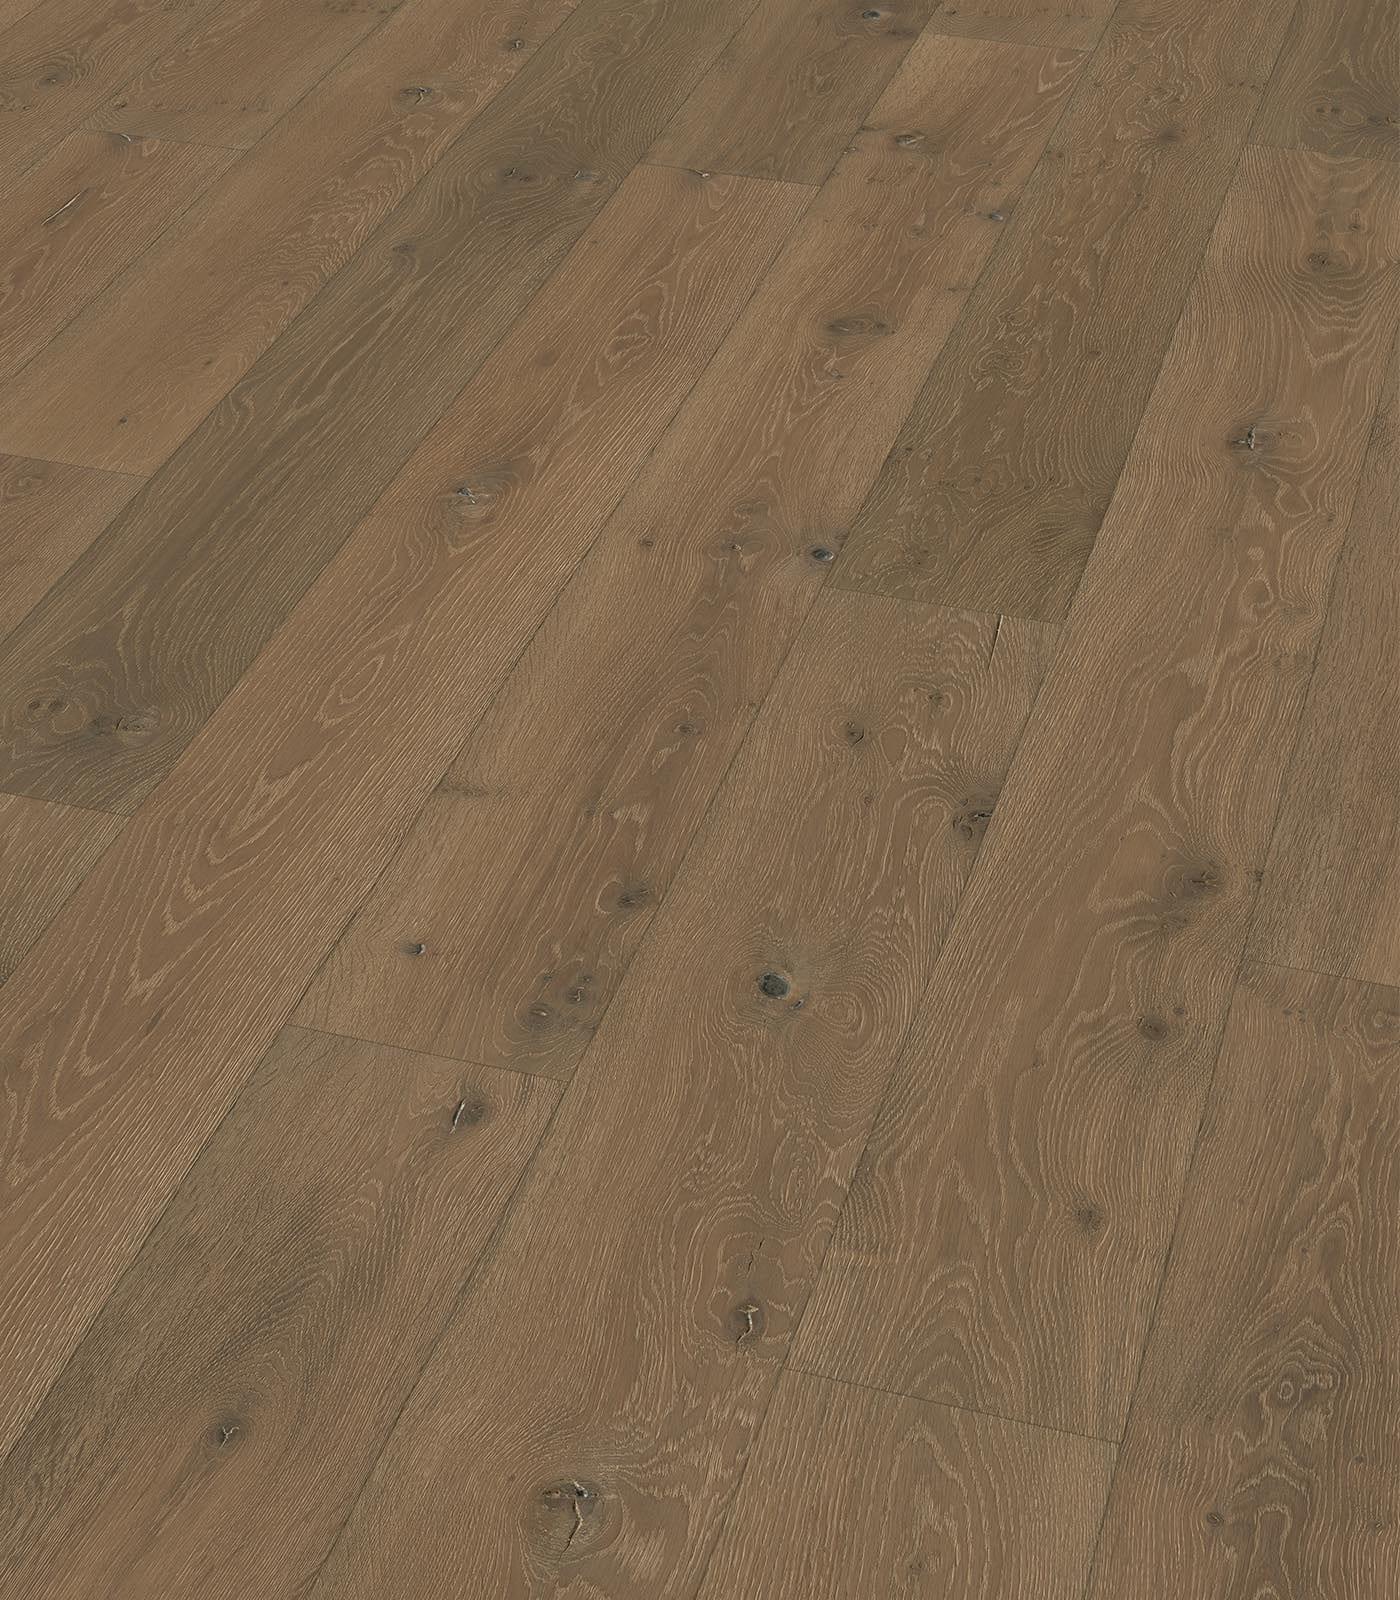 San Marino-Heritage Collection-European Oak Floors-angle